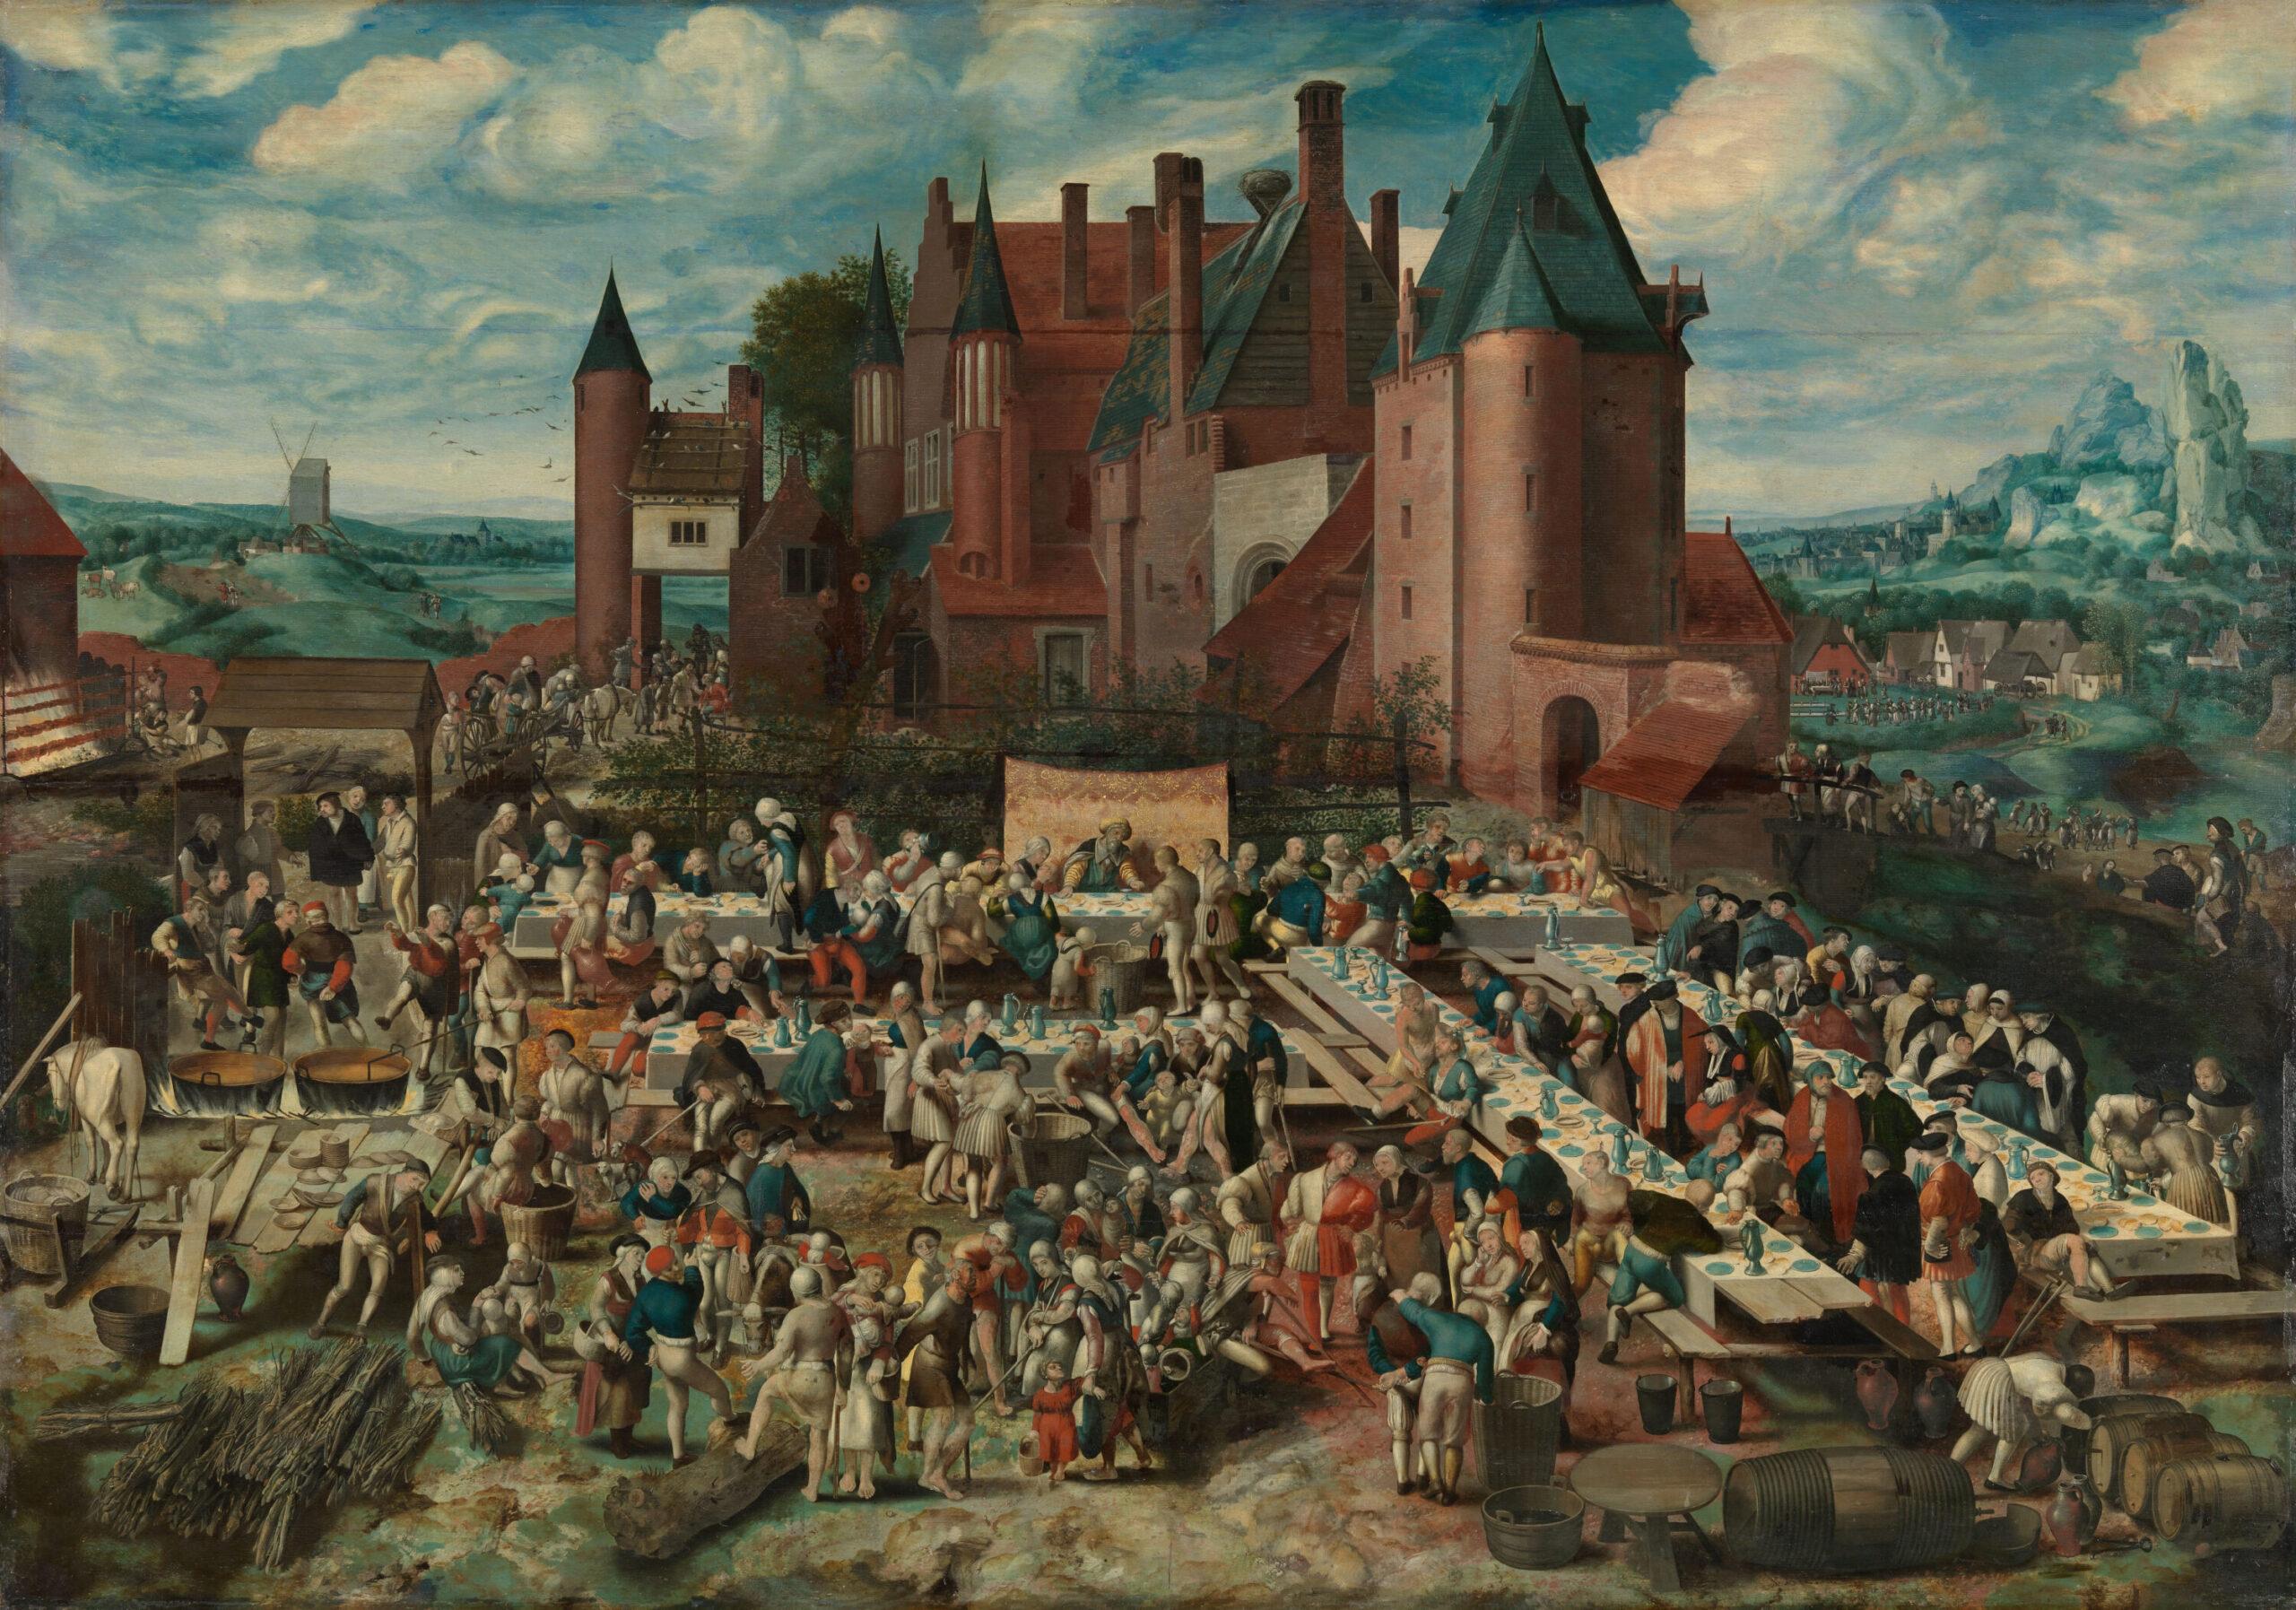 Fig. 2. Braunschweiger Monogrammist (active 2nd quarter of 16th century), Parable of the Great Banquet of the Rich Man, panel, 120.6 x 171.8 cm, Herzog Anton Ulrich-Museum Braunschweig, inv. no. GG 165